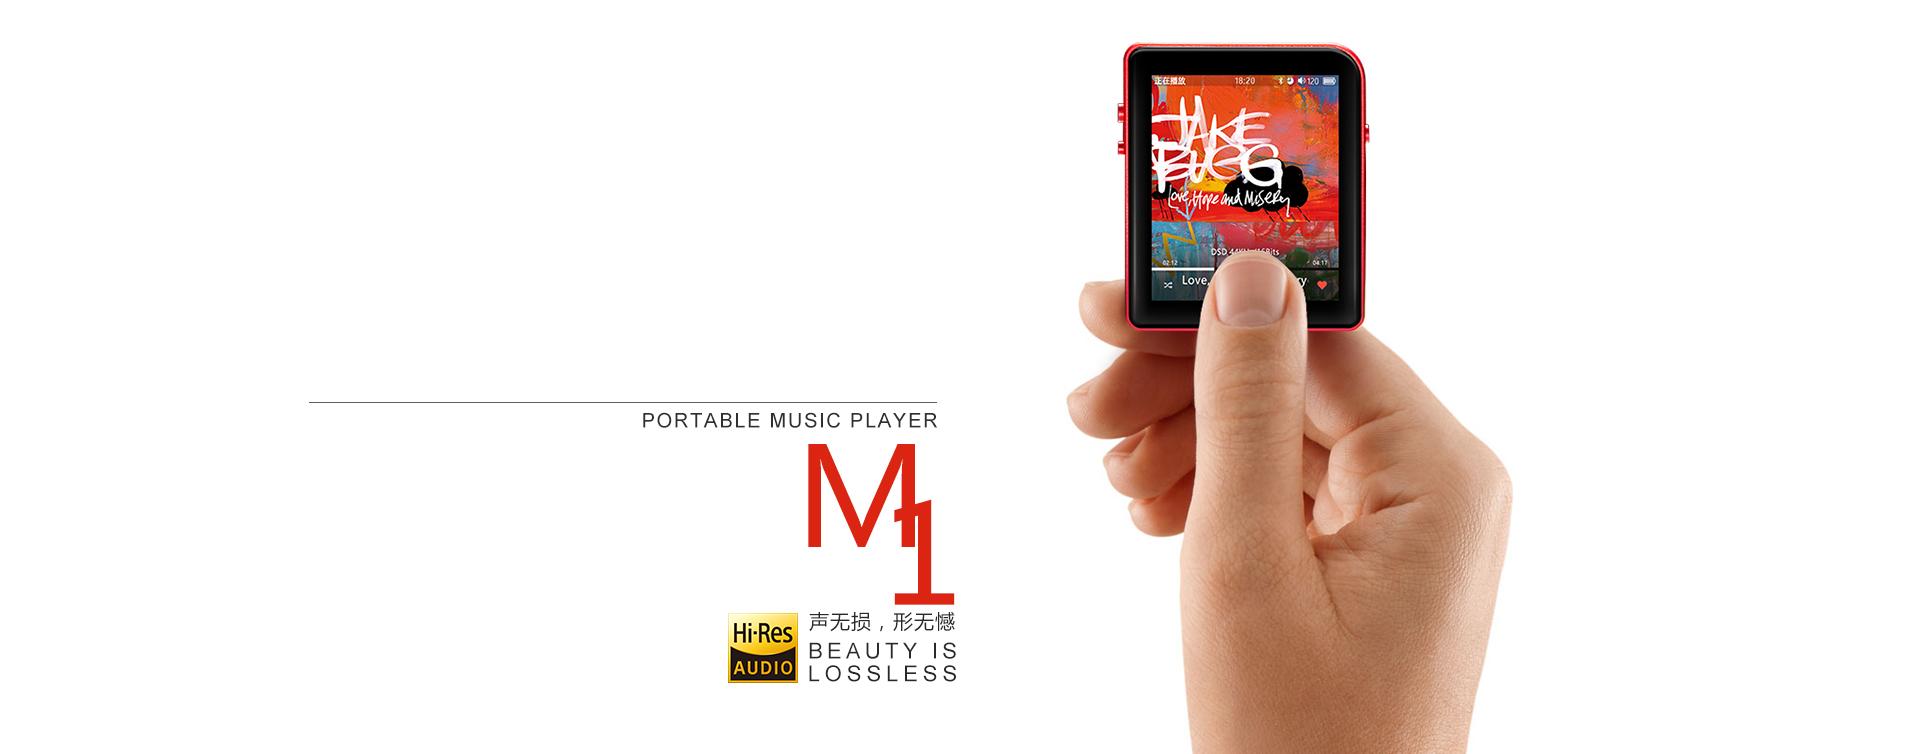 M1_02.jpg